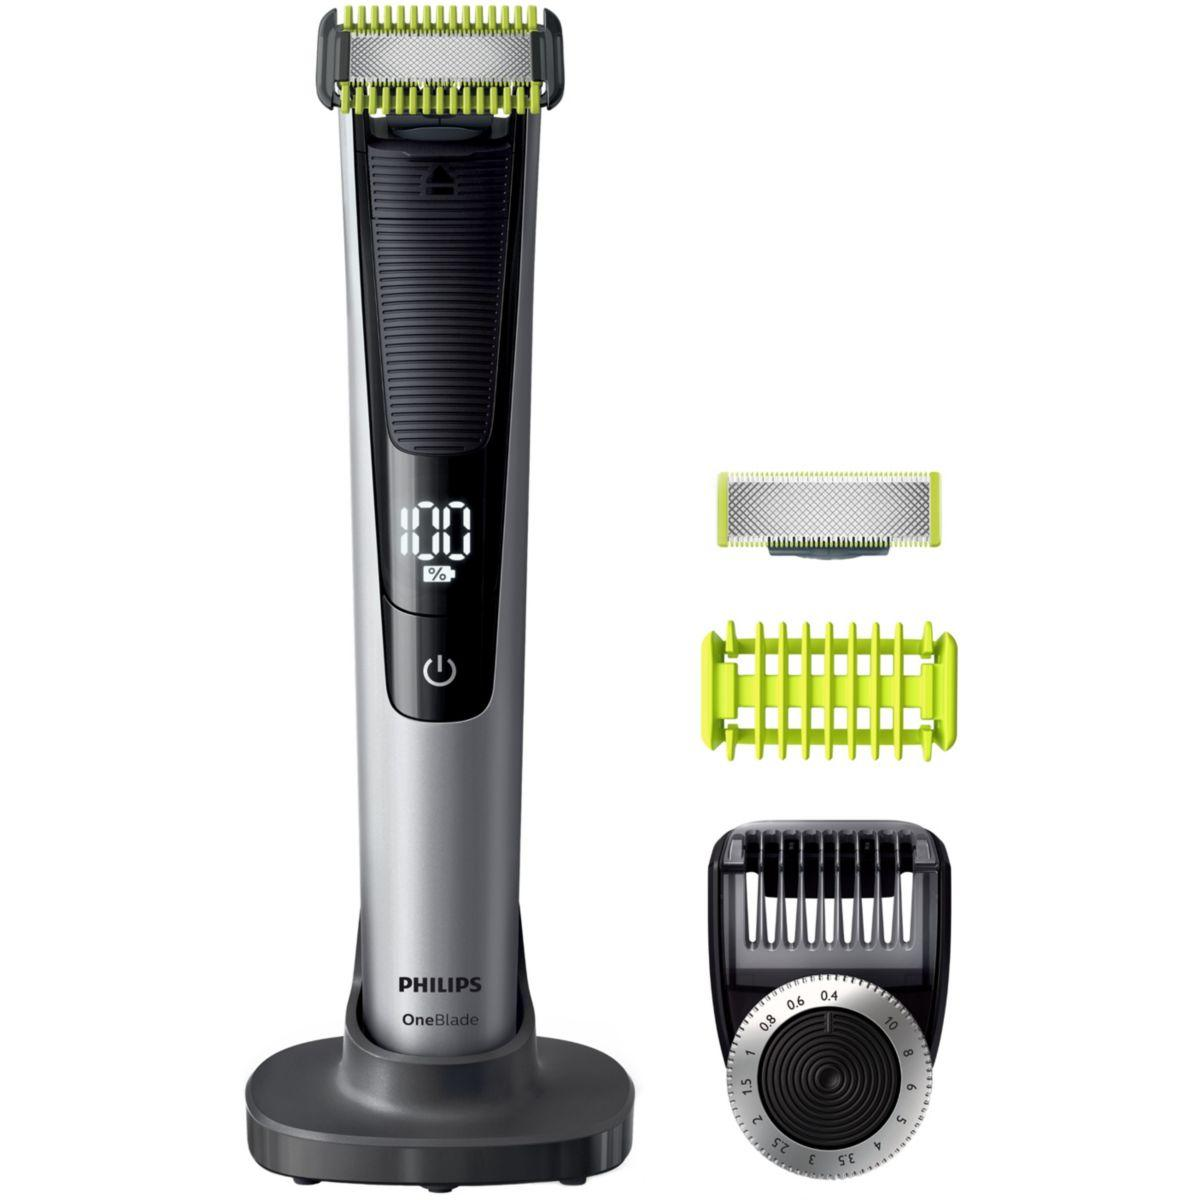 Tondeuse barbe et corps philips one blade qp6620/20 - livraison offerte : code premium (photo)